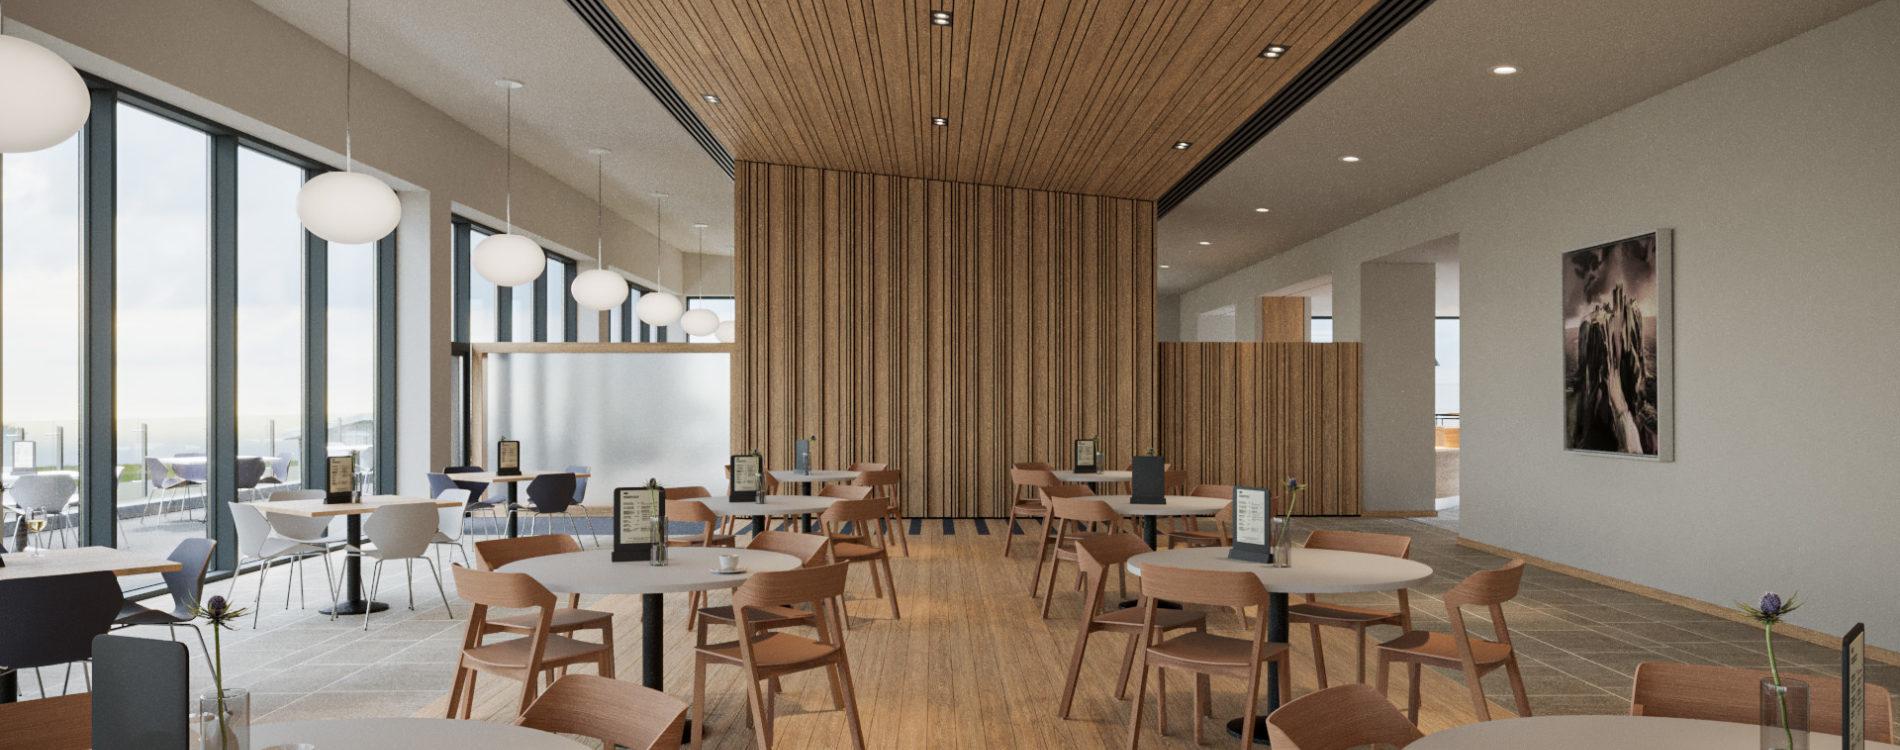 Visitor centre cafe 002